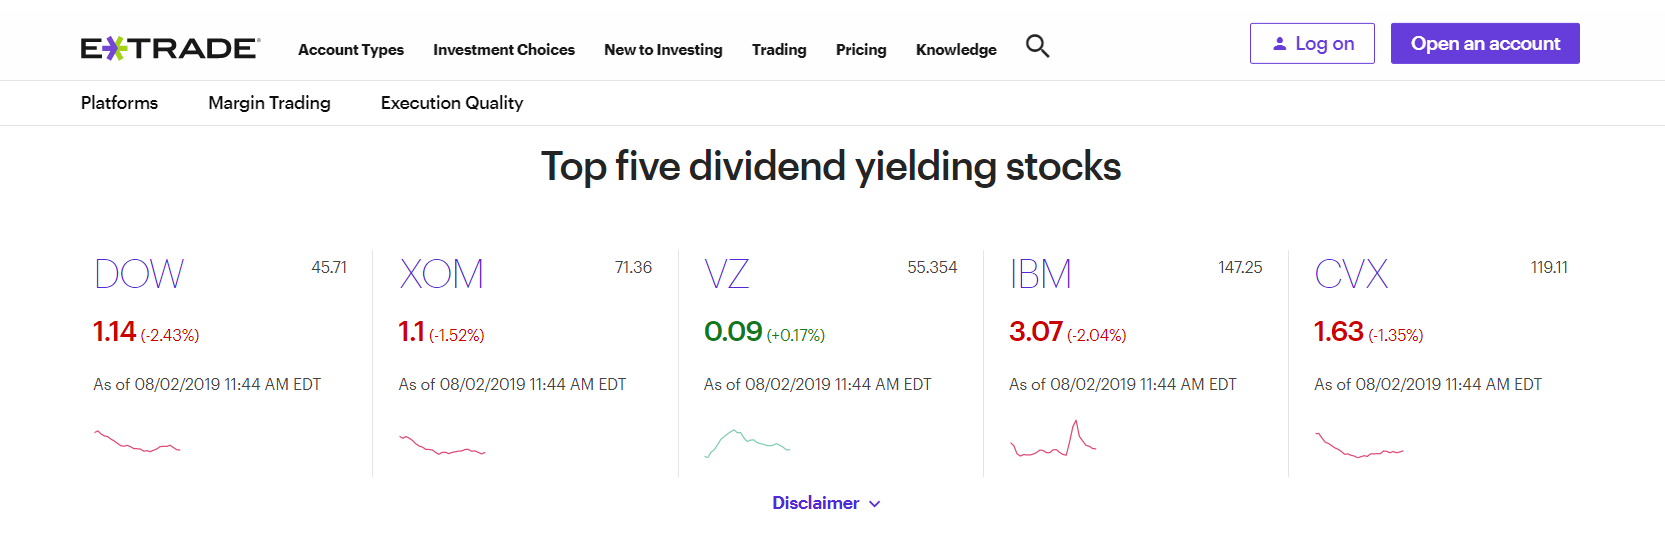 etrade online stock trading